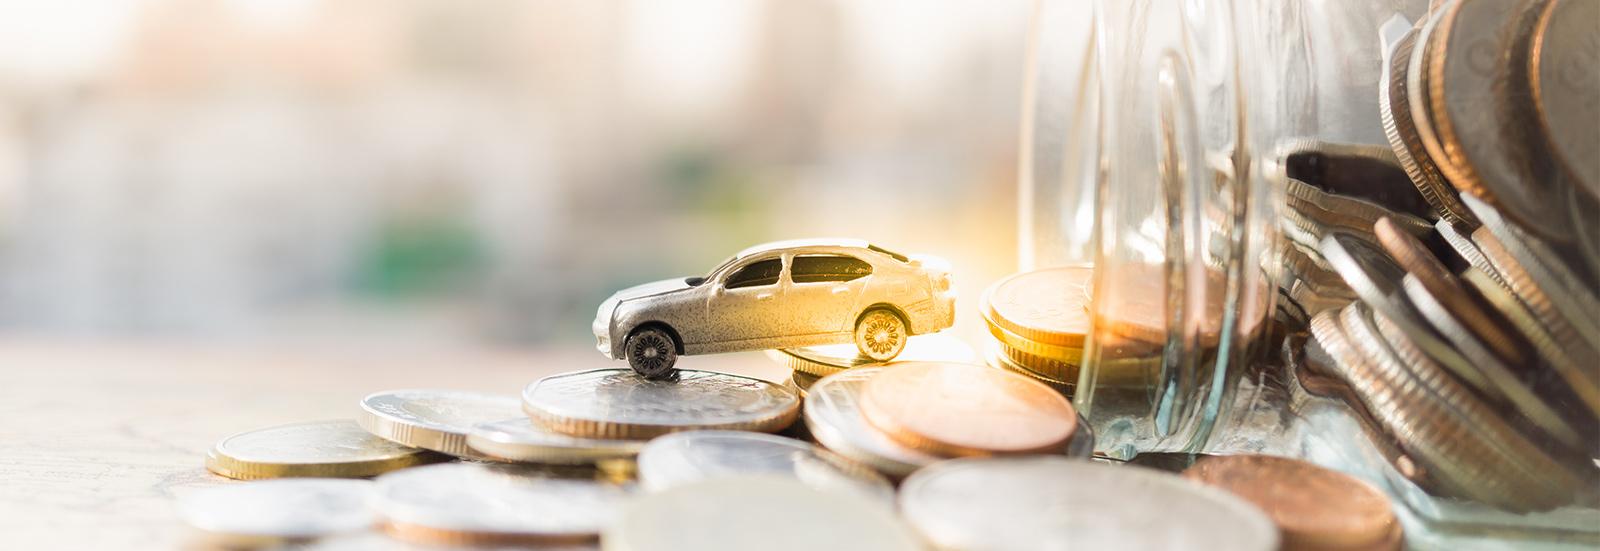 financement auto loa lld audi bmw mercedes